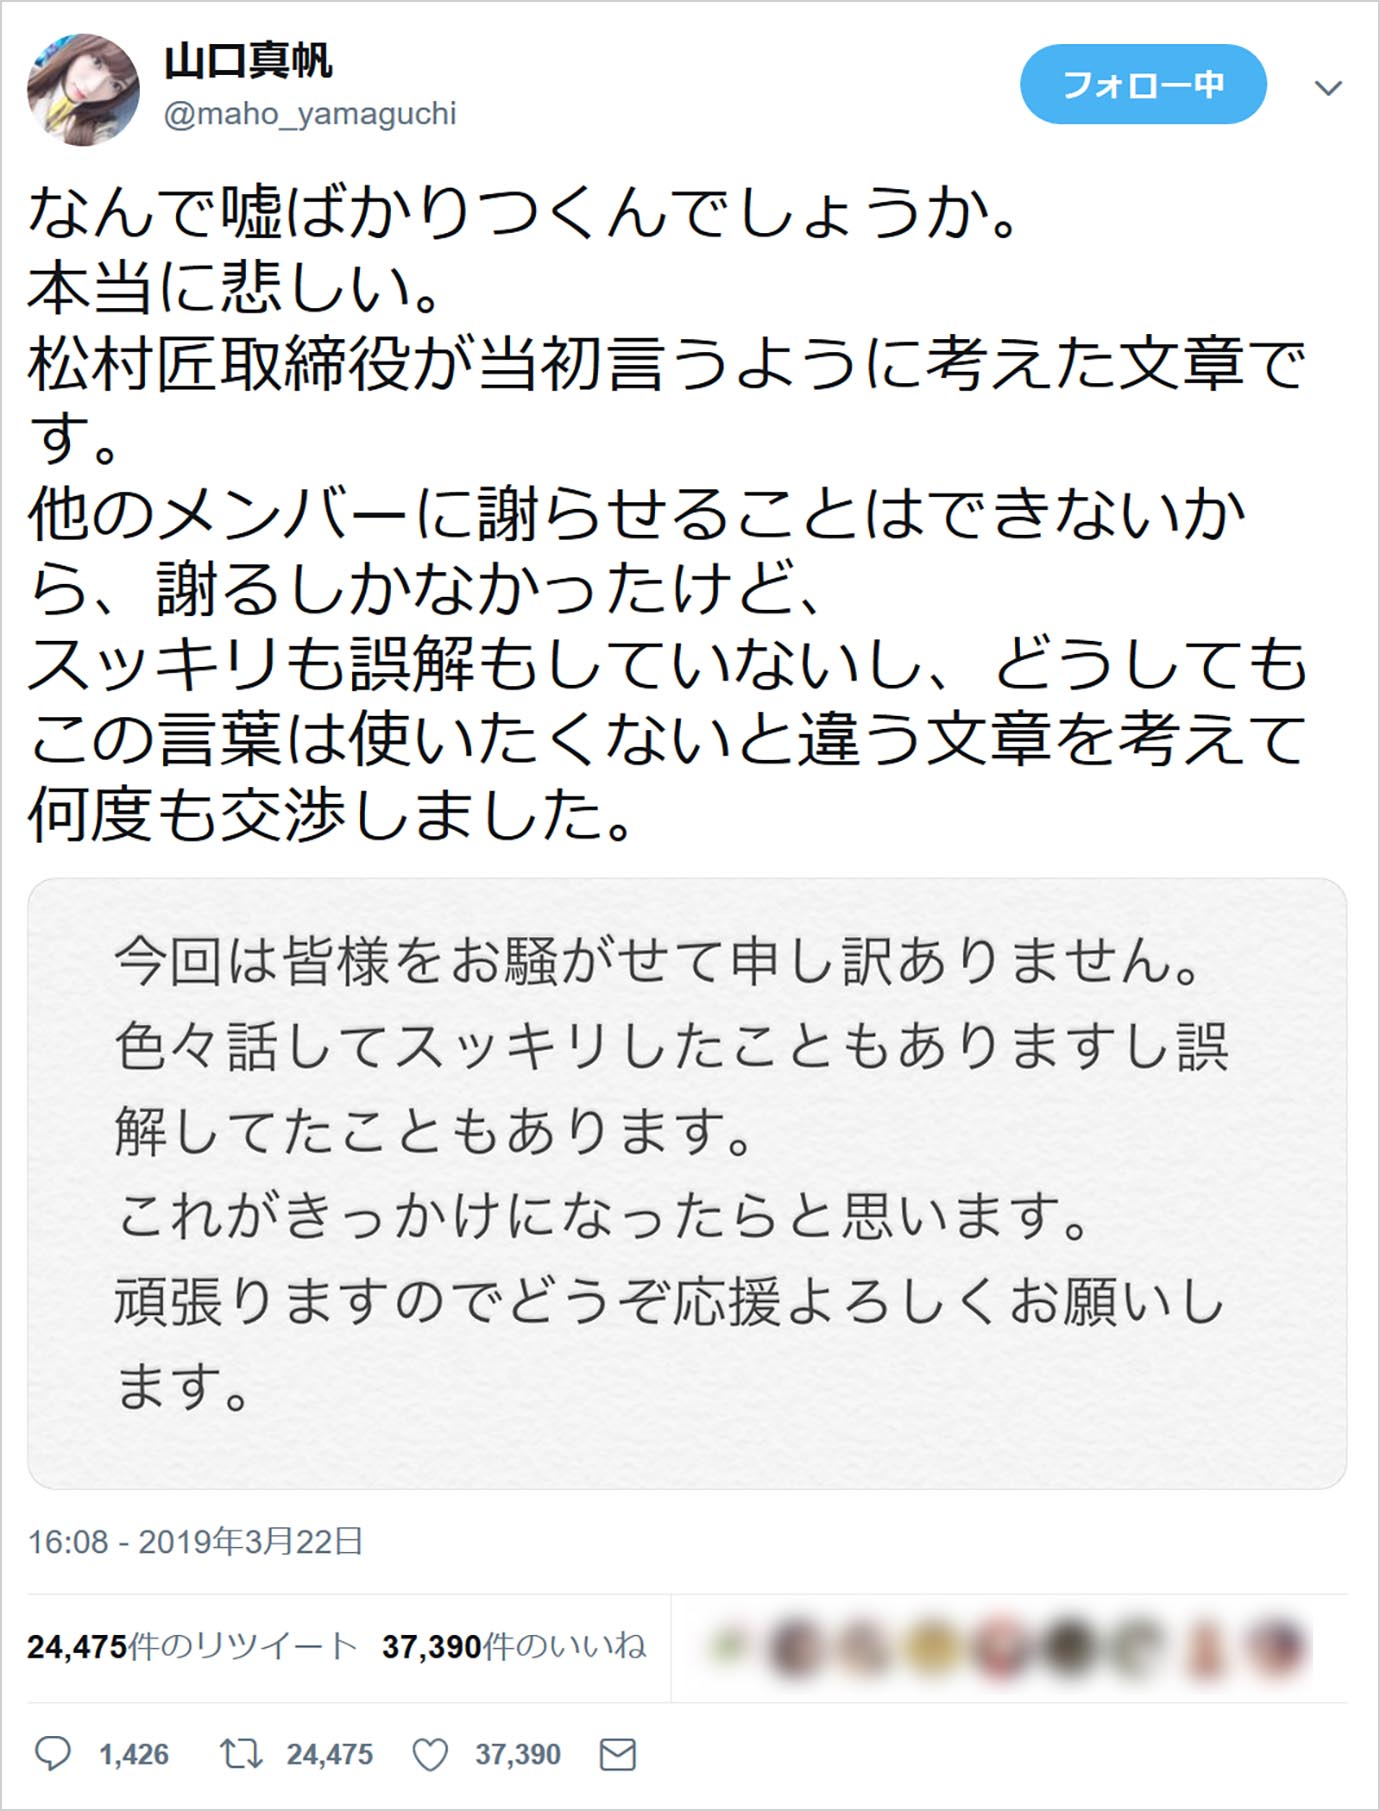 ngt48-yamaguchi-maho